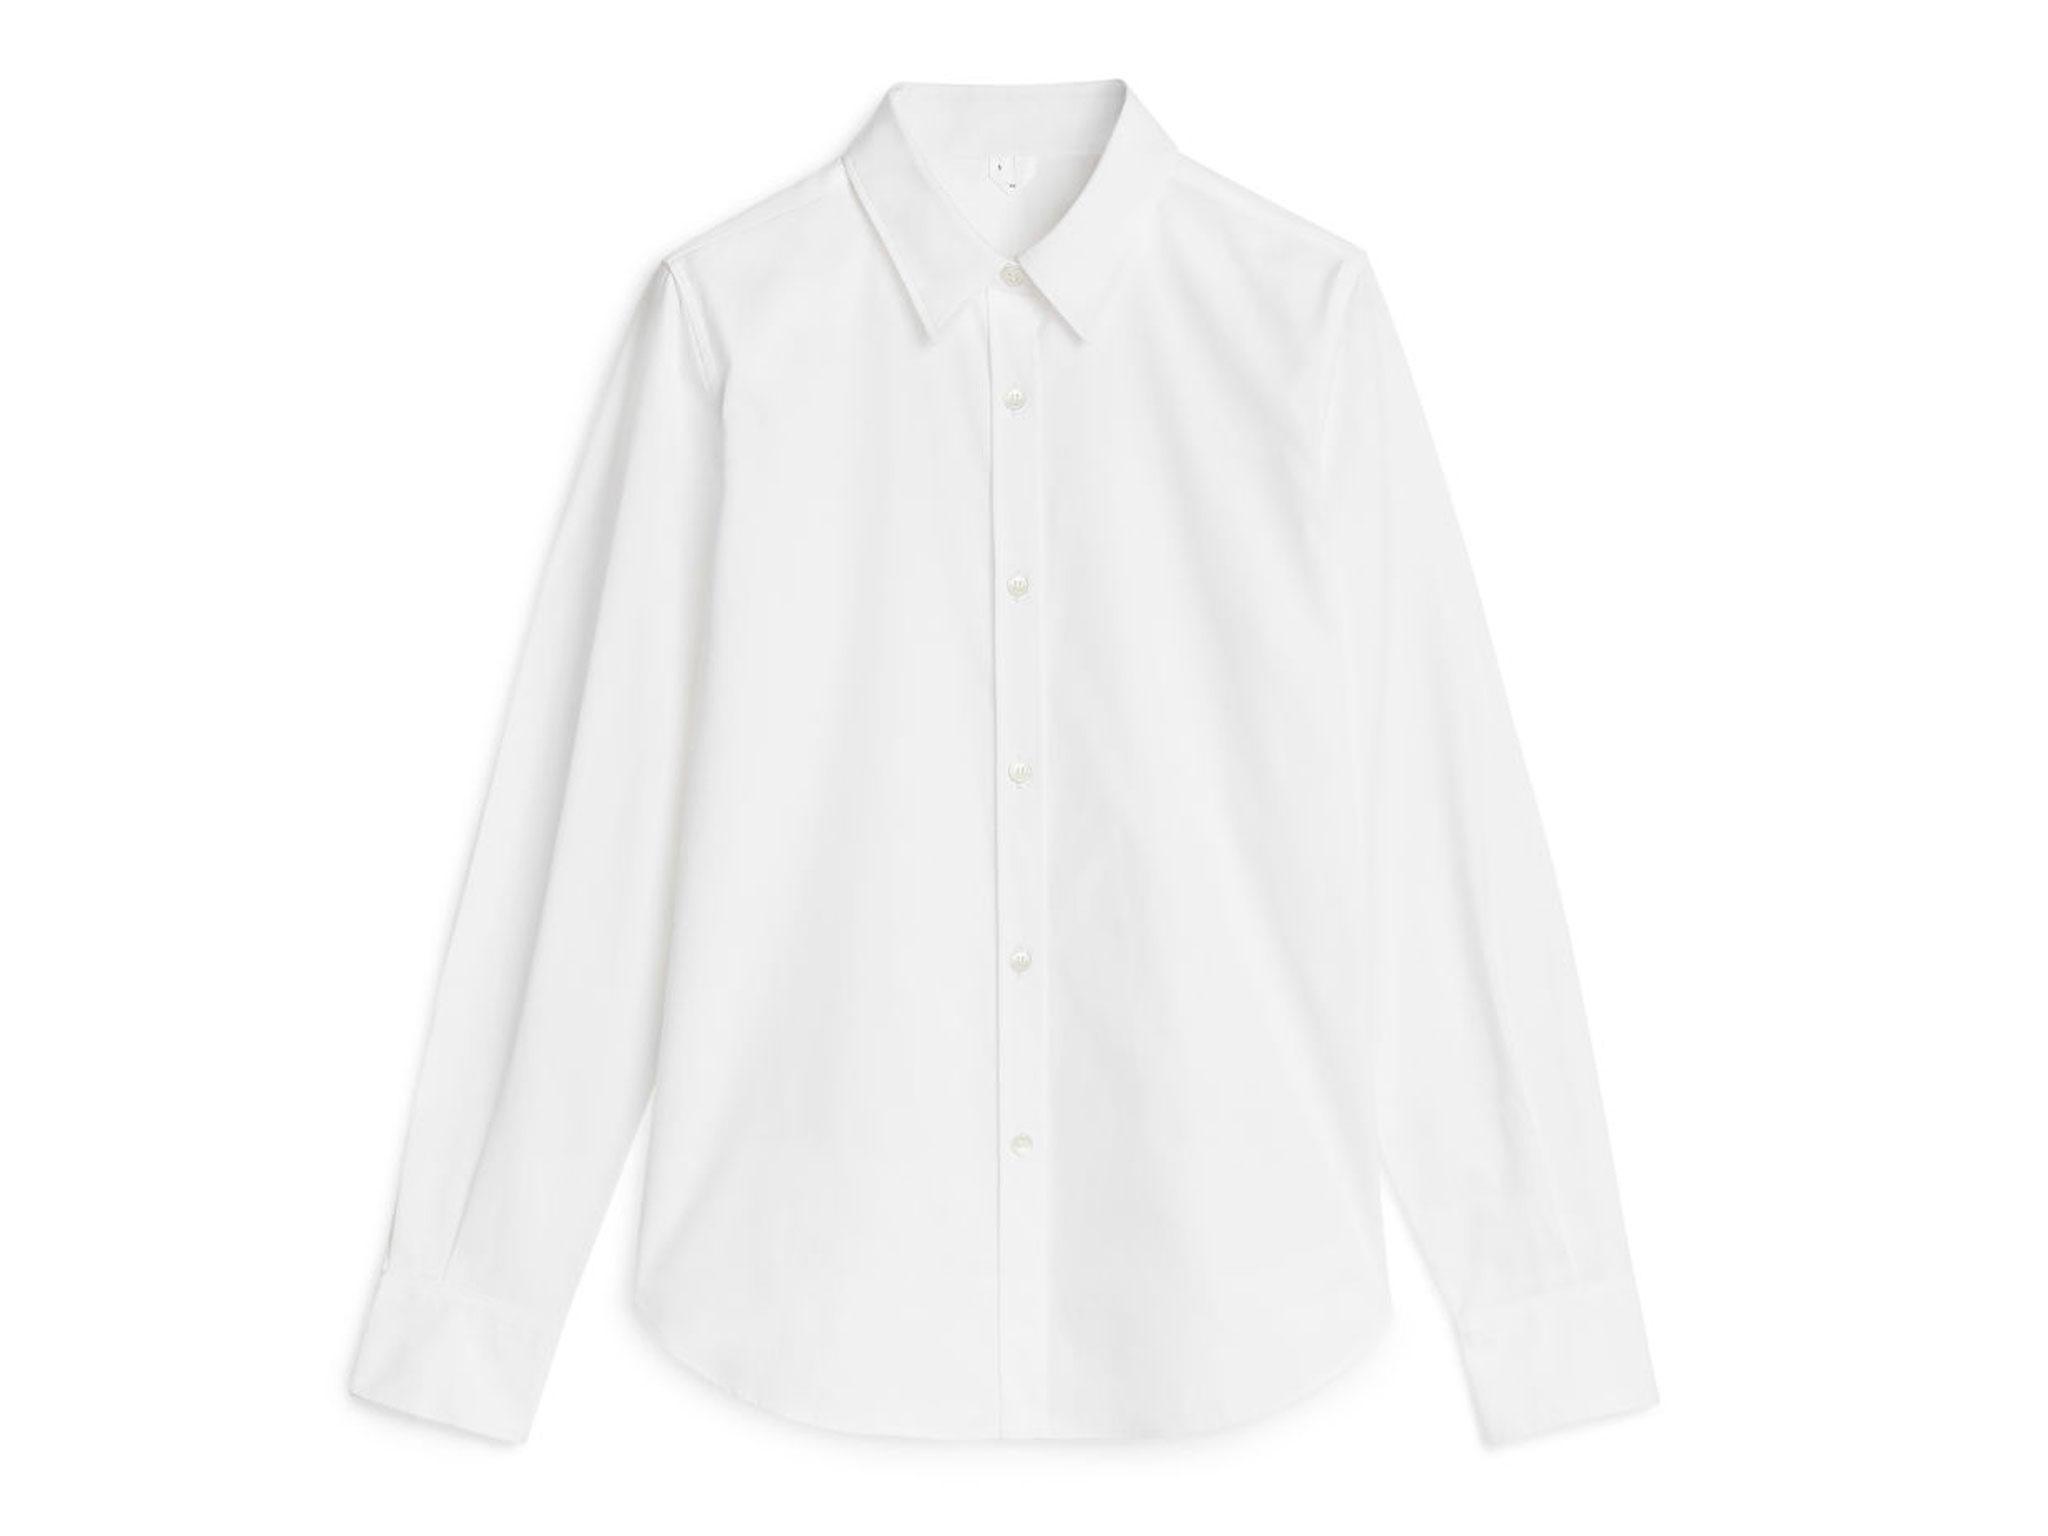 Arket Oxford Dress Shirt 45 Arket